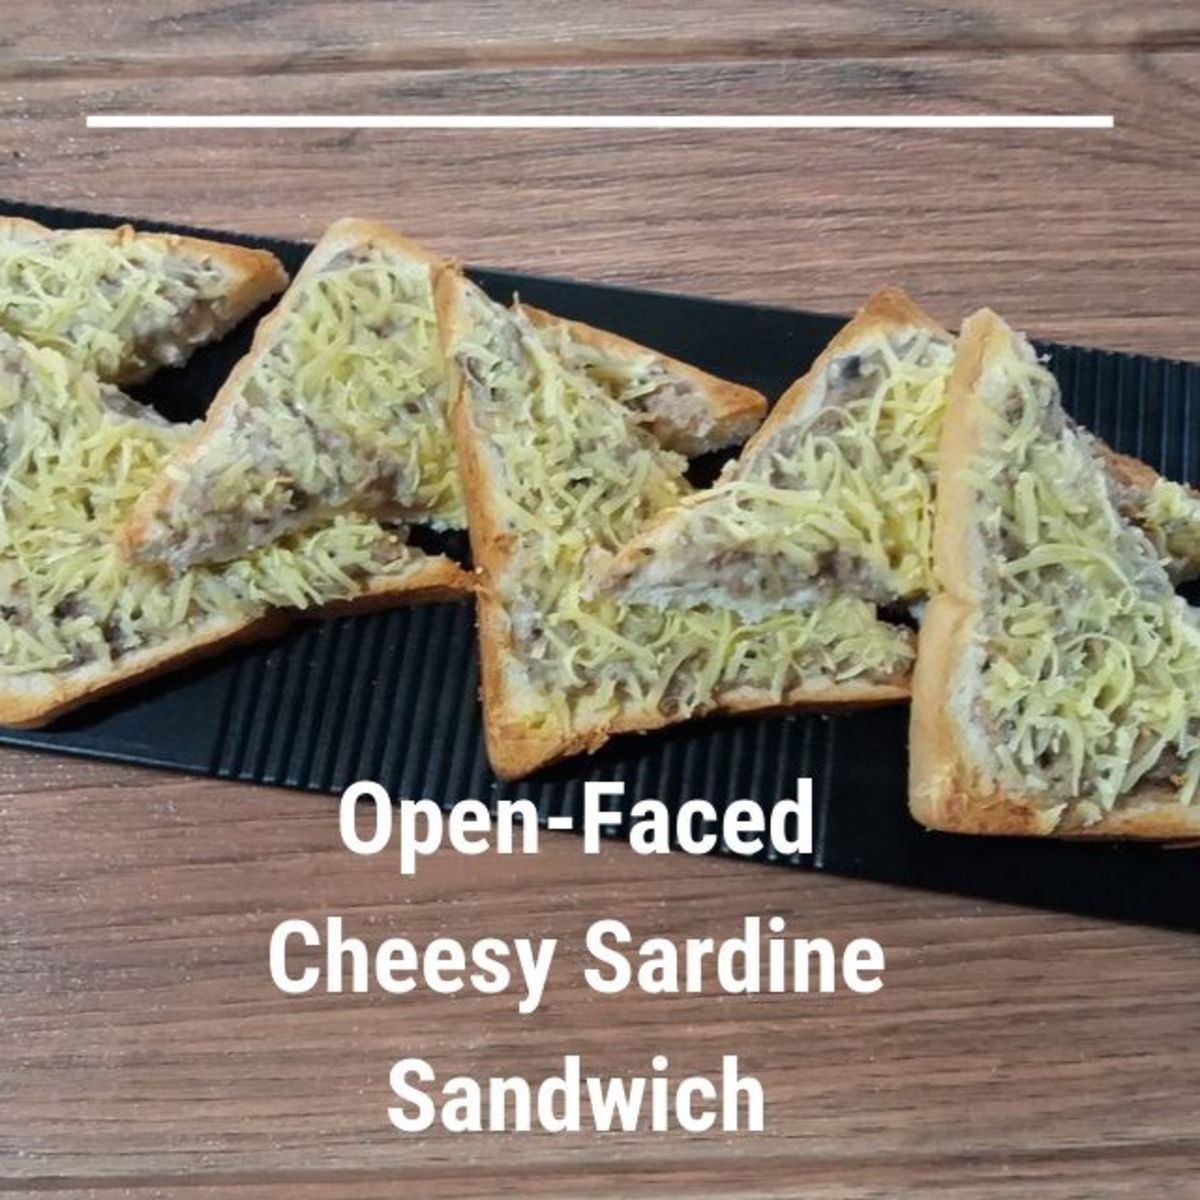 Learn how to prepare an open-faced cheesy sardine sandwich